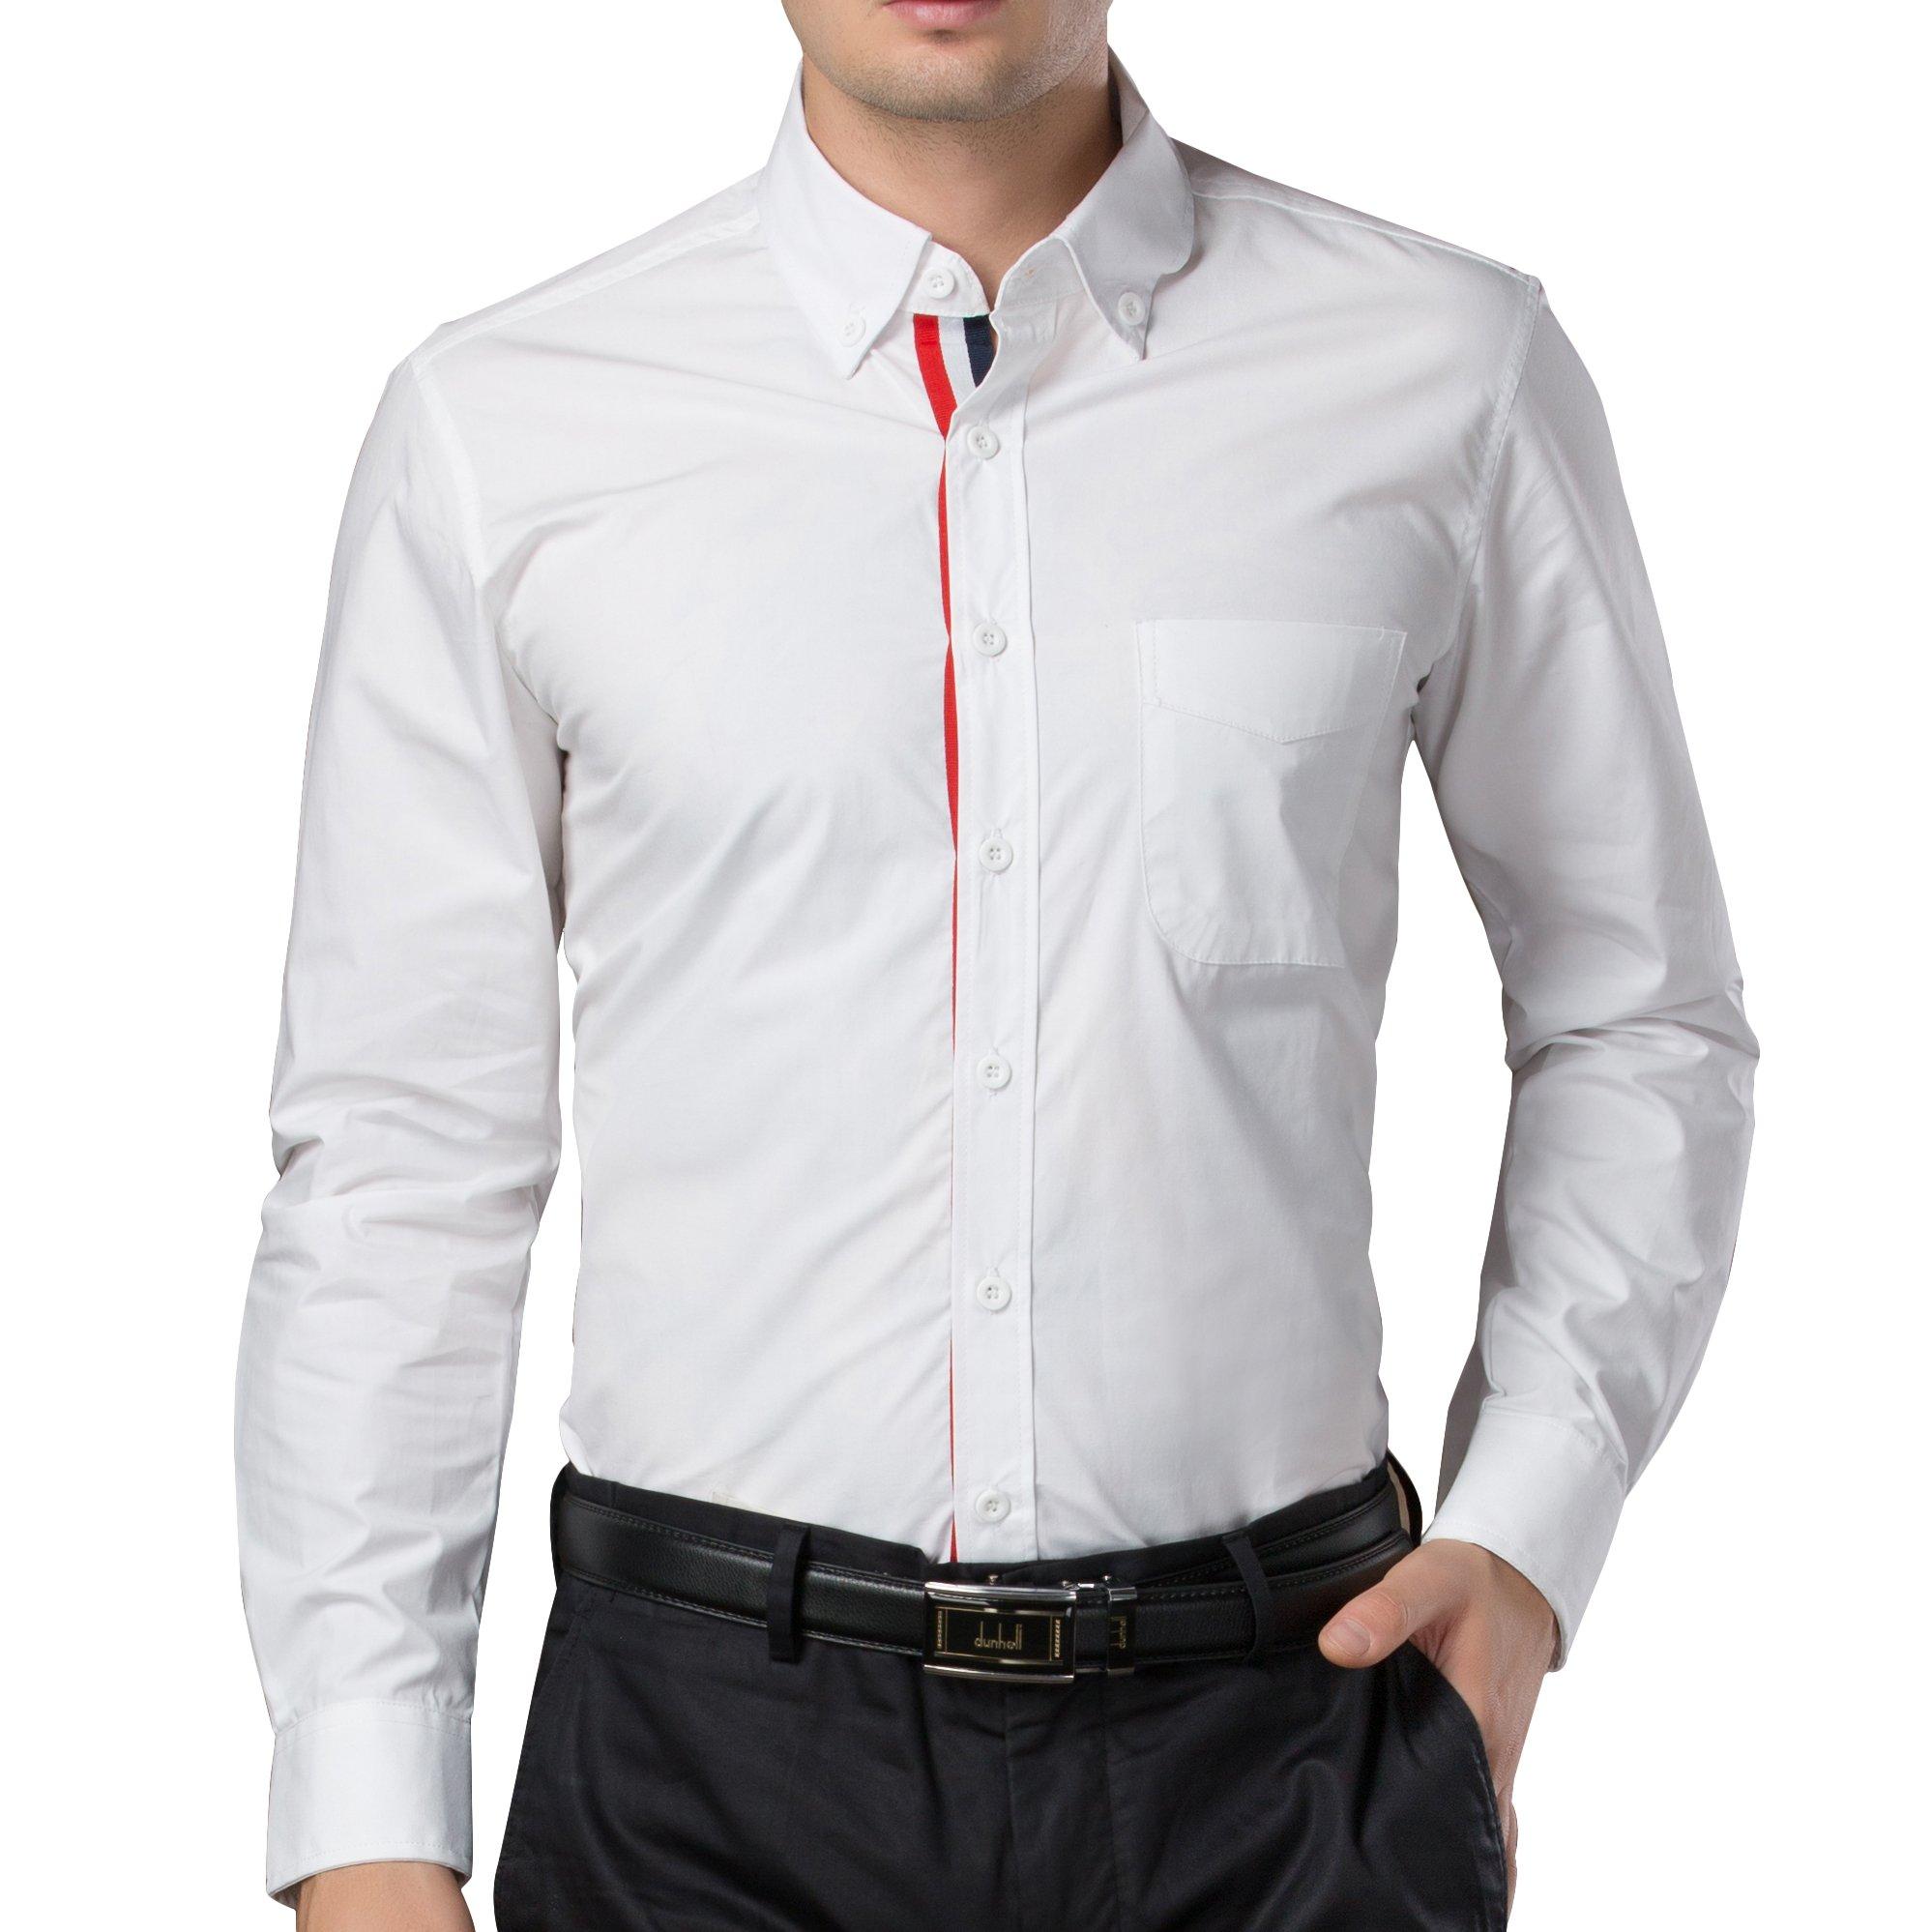 Paul Jones Mens Casual Lapel Neck Dress Shirts Size S, White 48-1